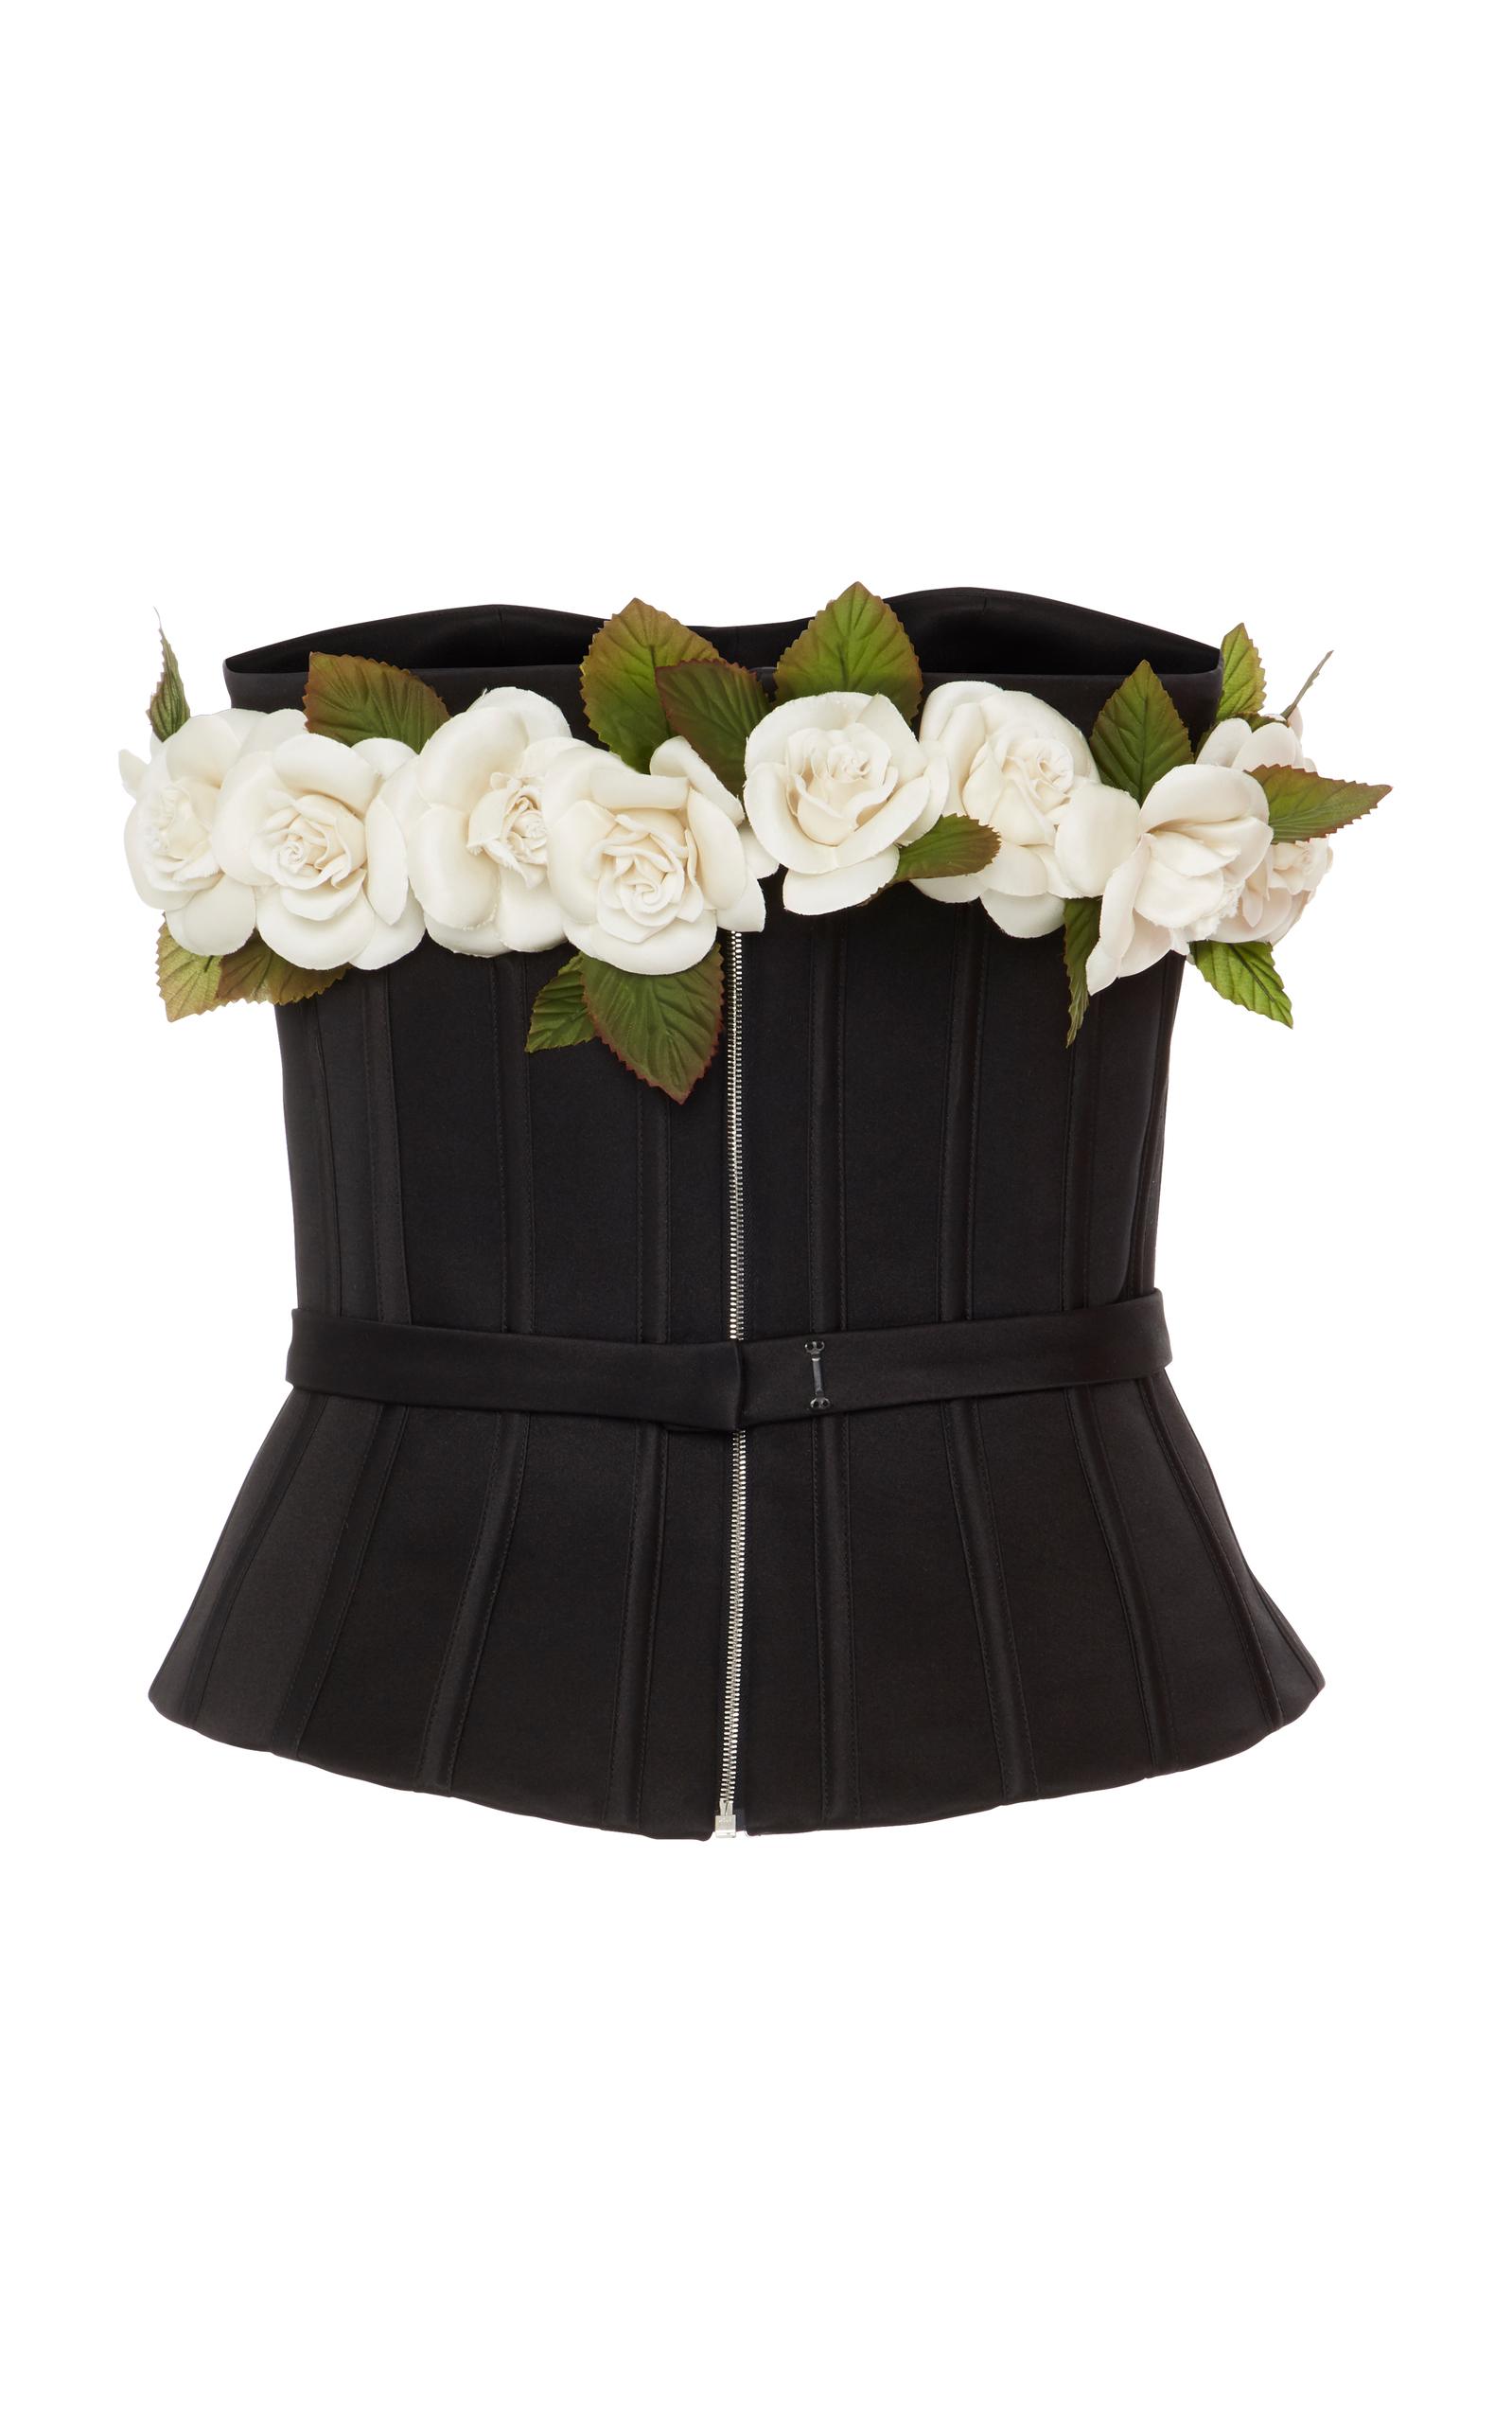 Corset Top With Flowers By Elizabeth Kennedy Moda Operandi